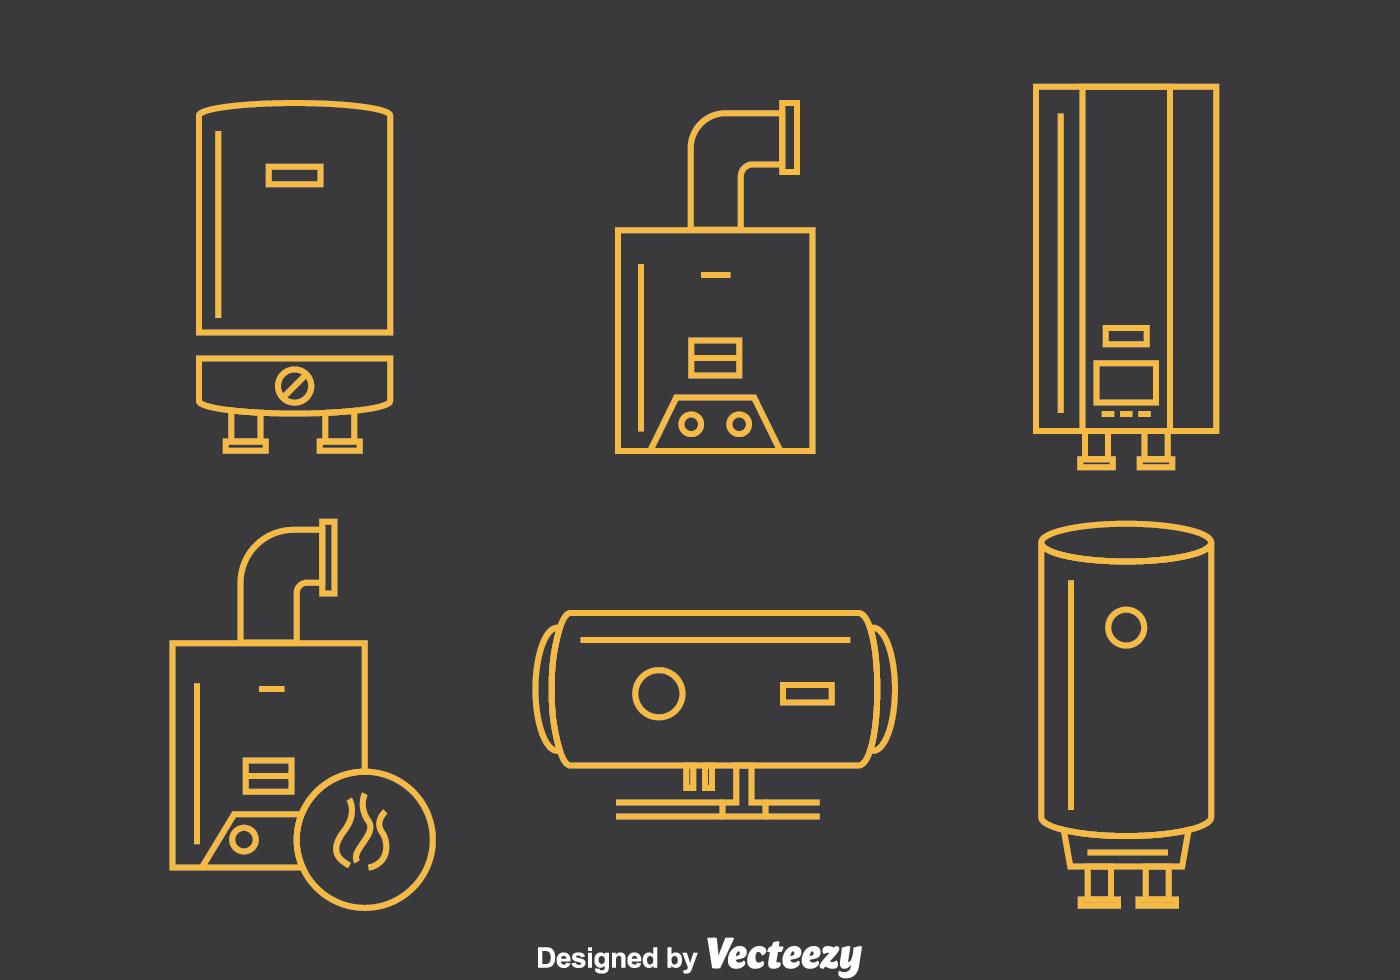 Water Heater Heat Pump Installation Tankless Water Heater